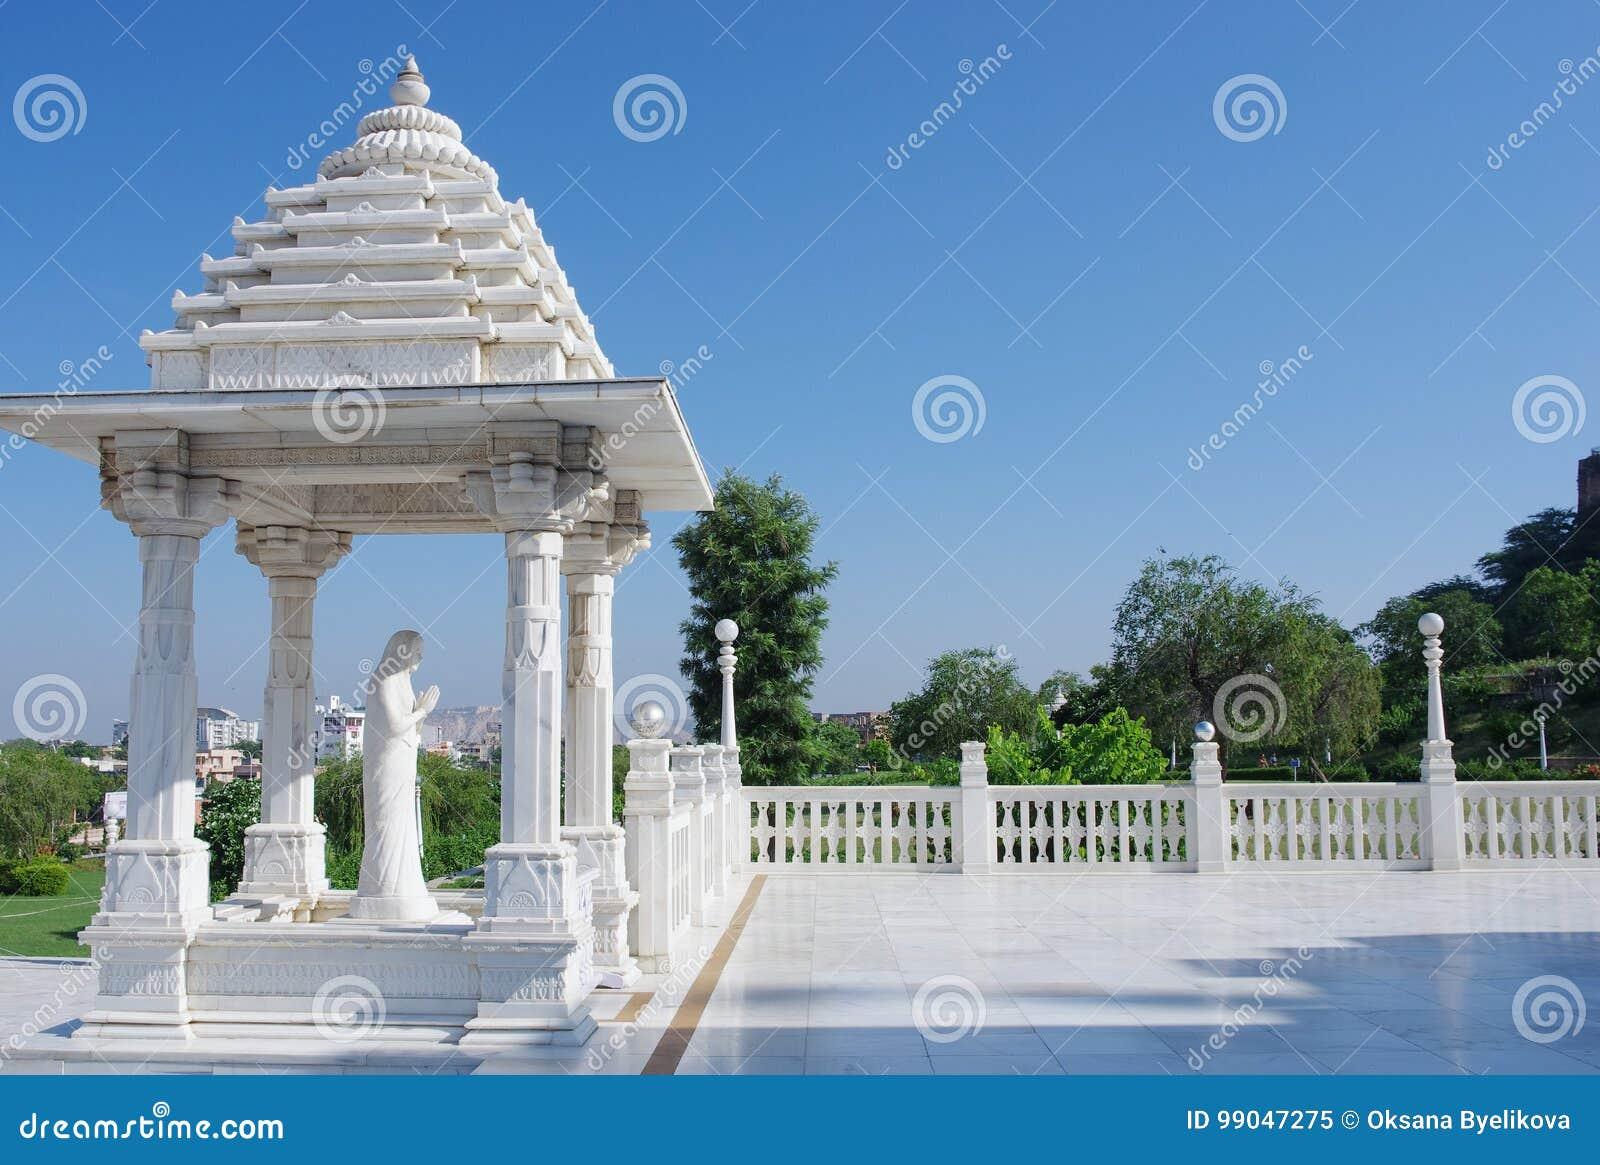 Shri Lakshmi纳拉扬寺庙Birla Mandir,斋浦尔,印度